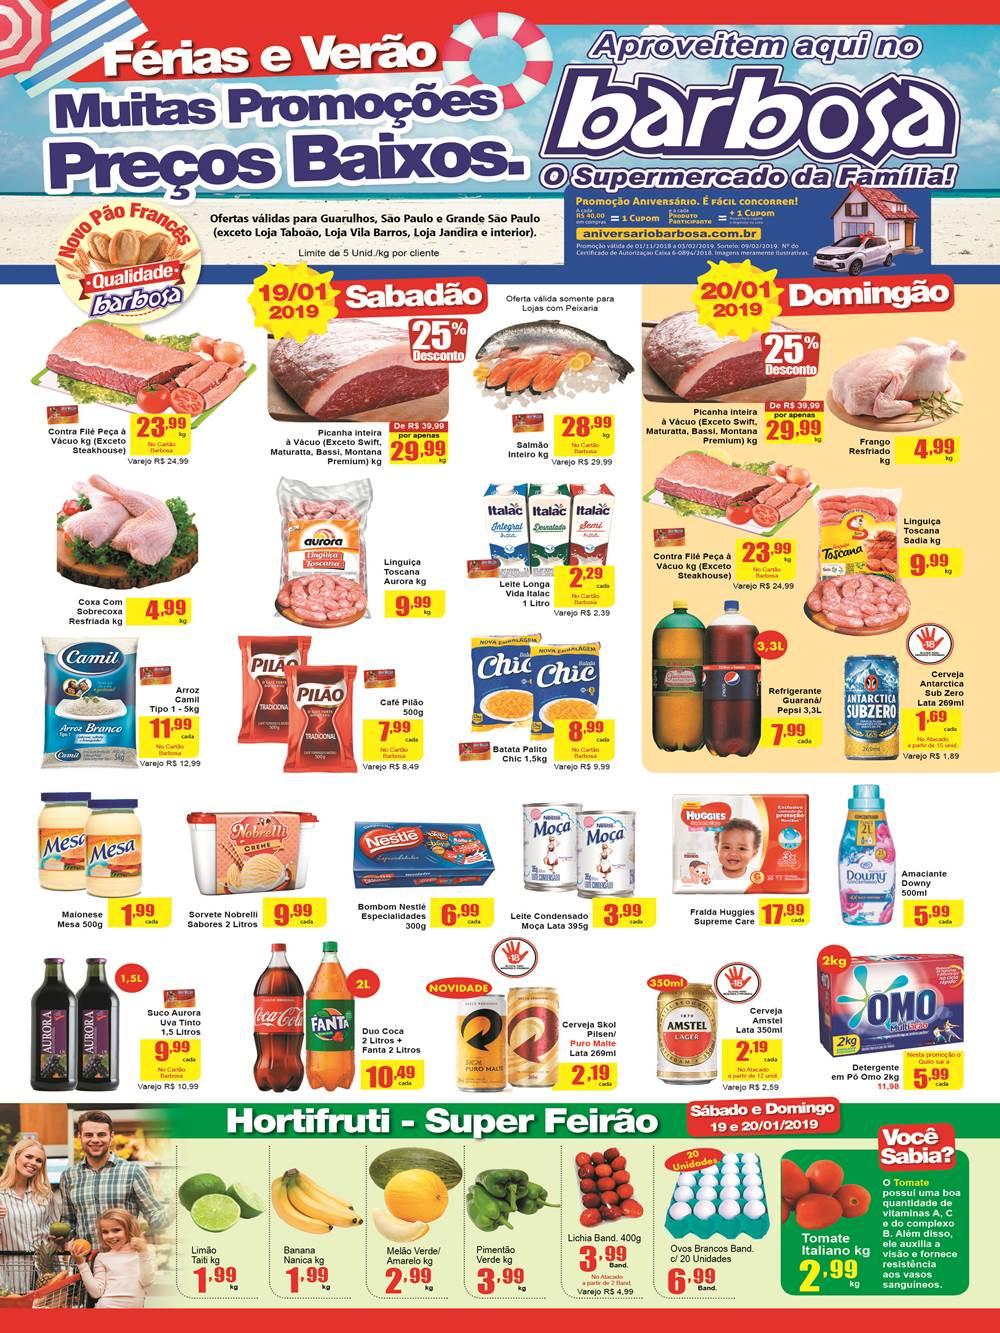 Ofertas-Barbosa1-1 Ofertas de Supermercados - Economize!